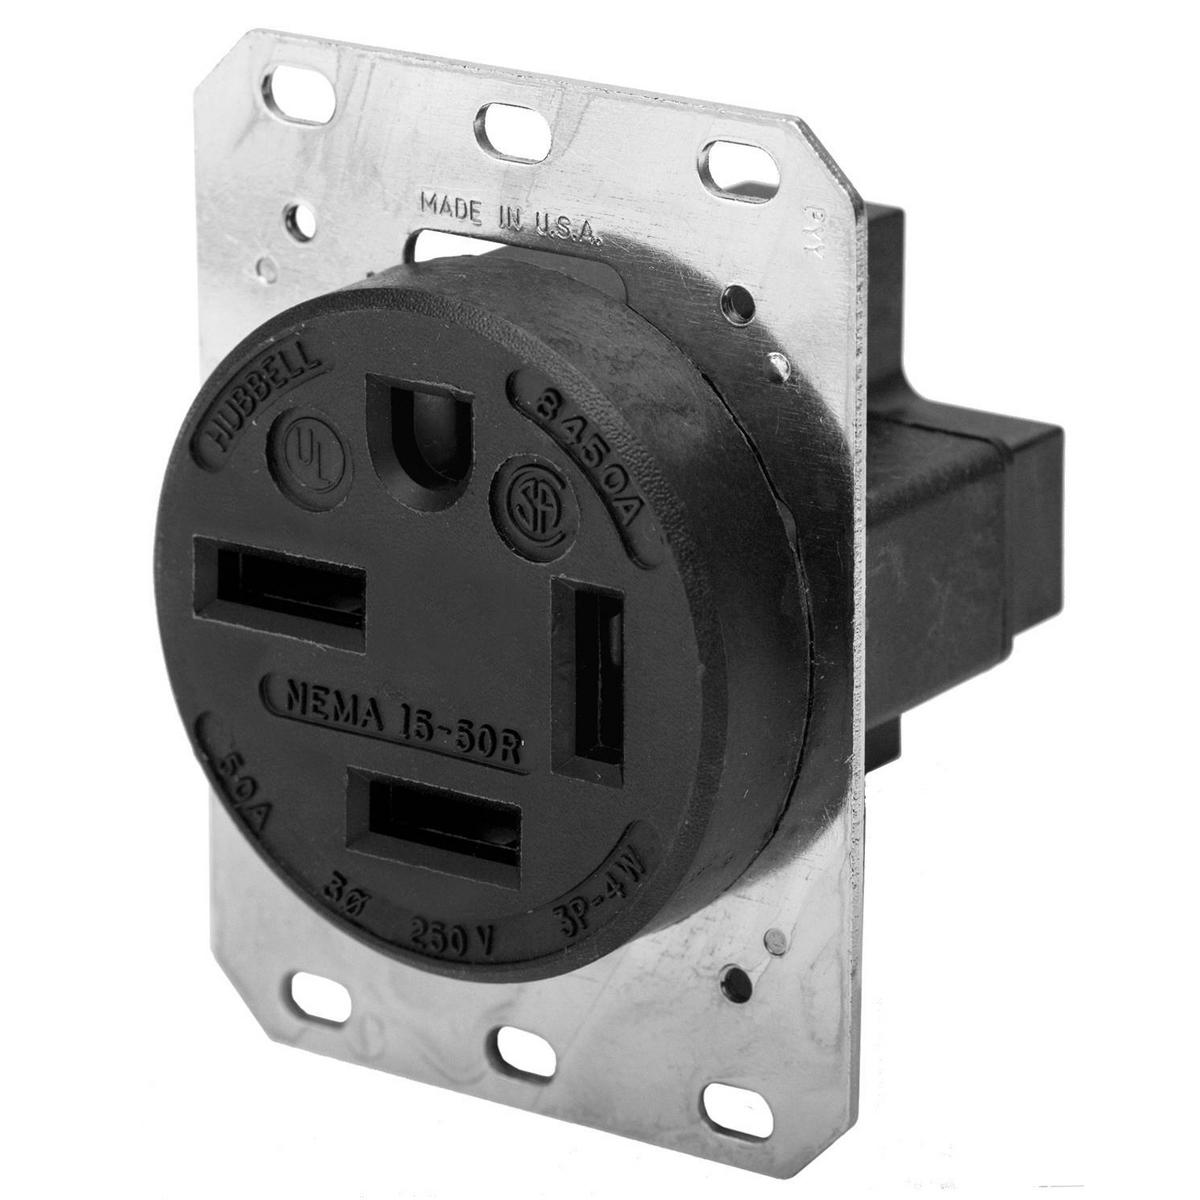 Hubbell HBL8450A 50 Amp 250 Volt 3-Pole 4-Wire NEMA 15-50R Black Single Straight Blade Receptacle